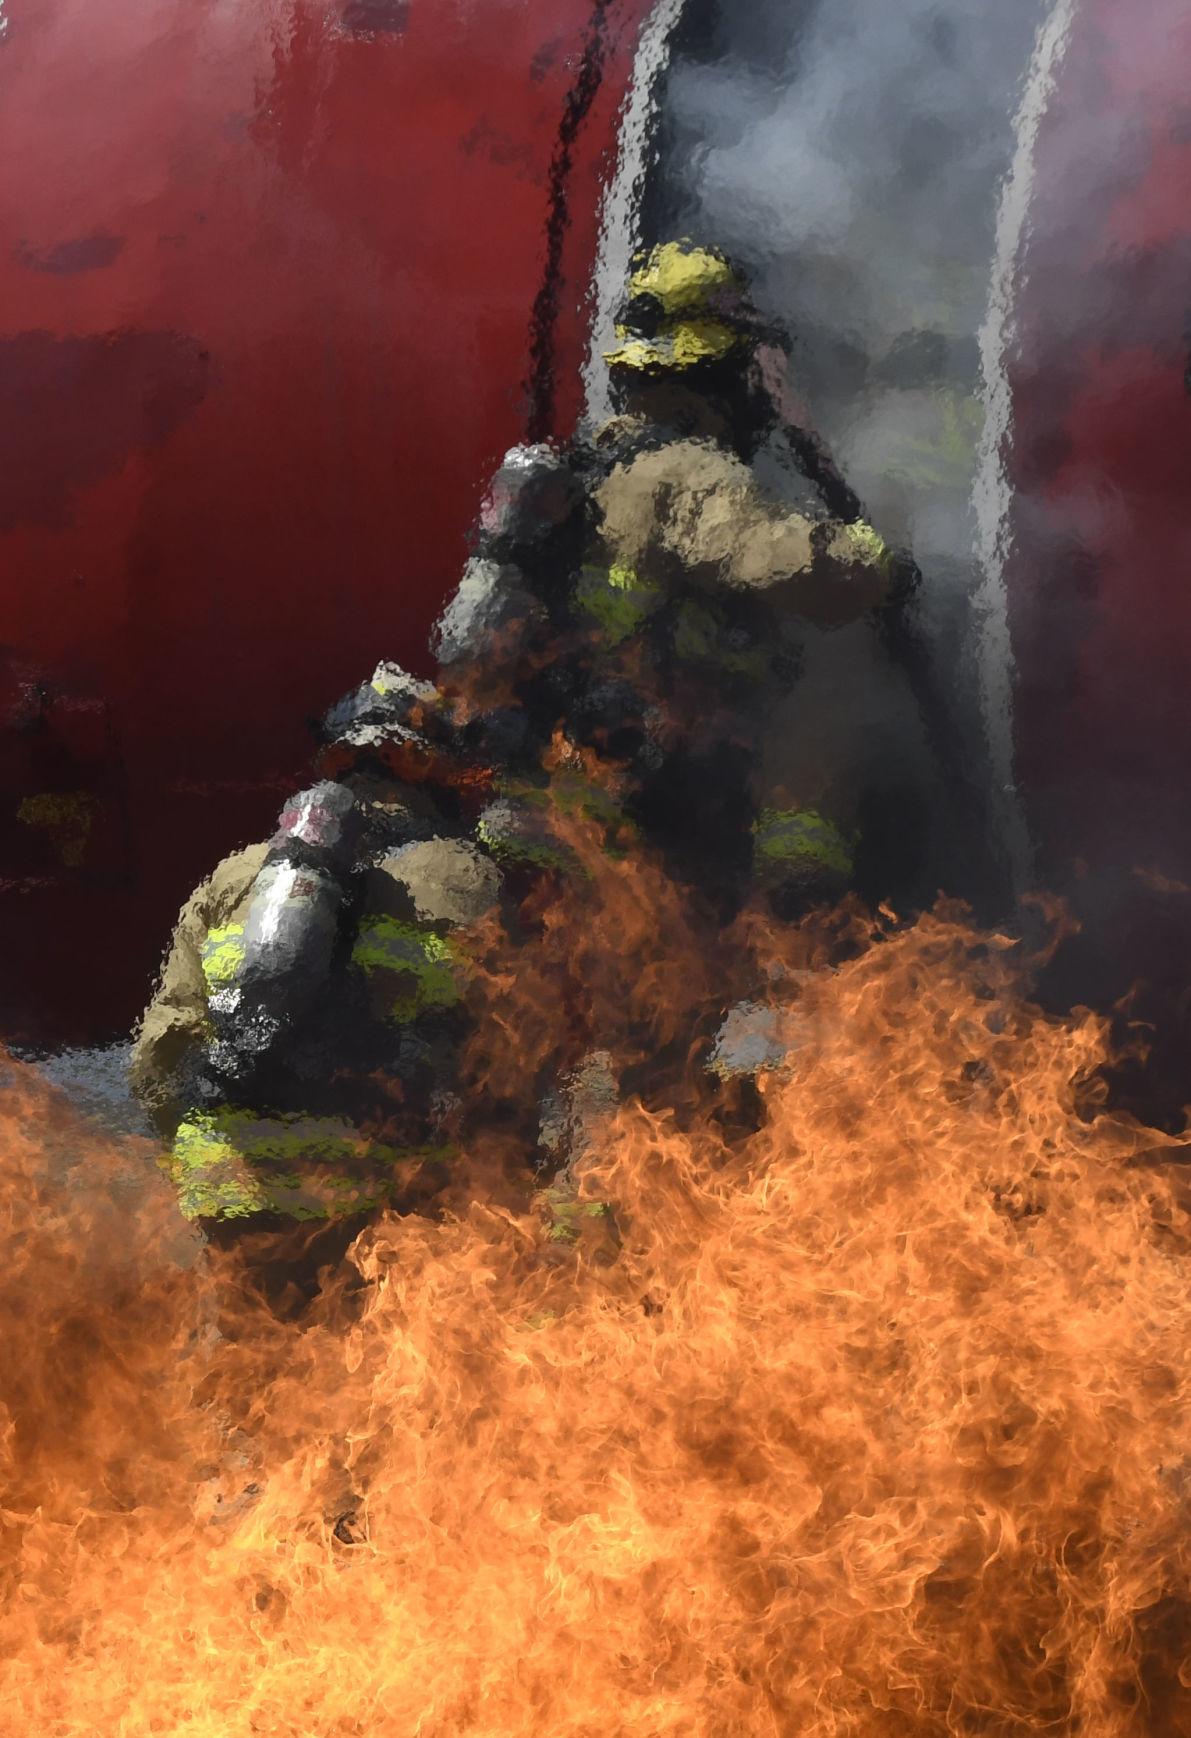 051920 Airport fire training 02.jpg